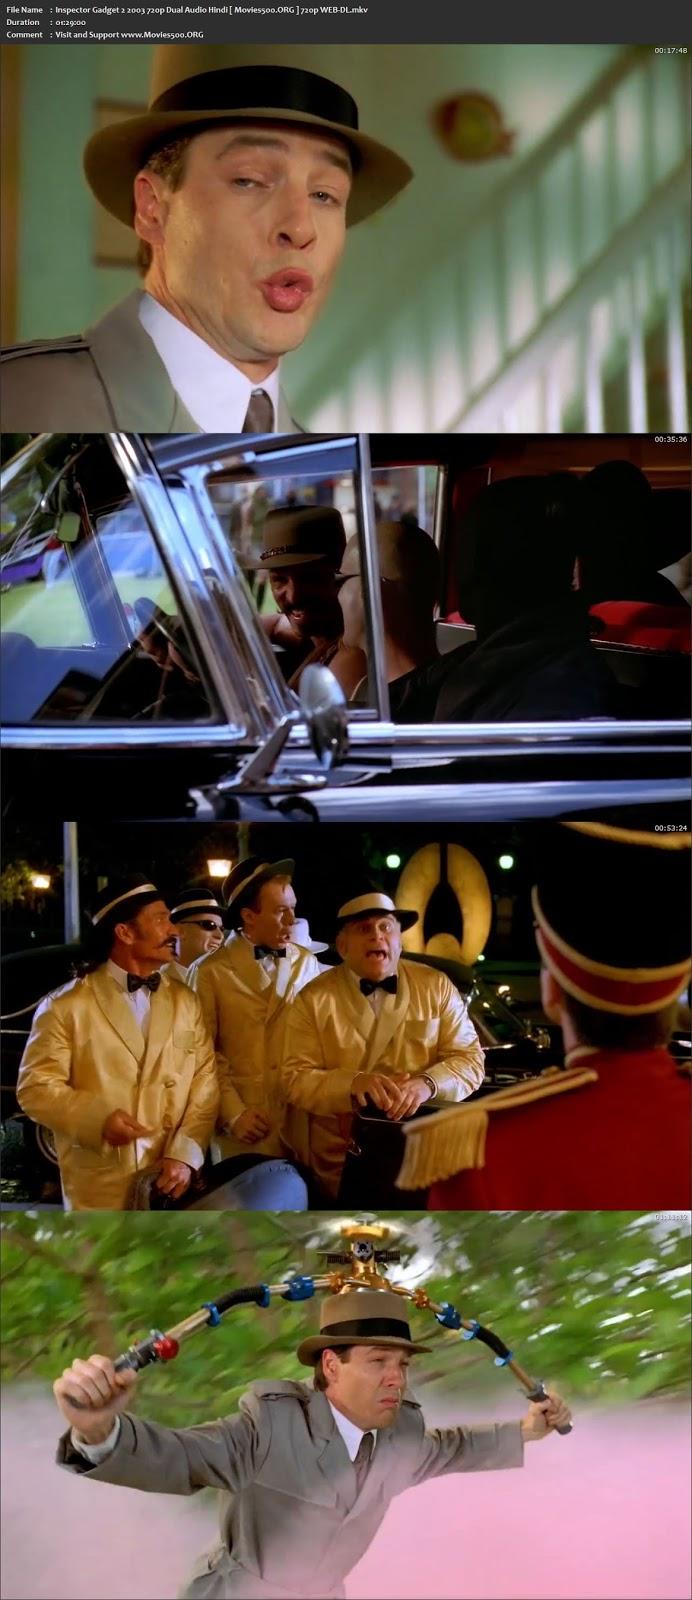 Inspector Gadget 2 (2003) Dual Audio Hindi WEB DL 720P ESubs at movies500.me